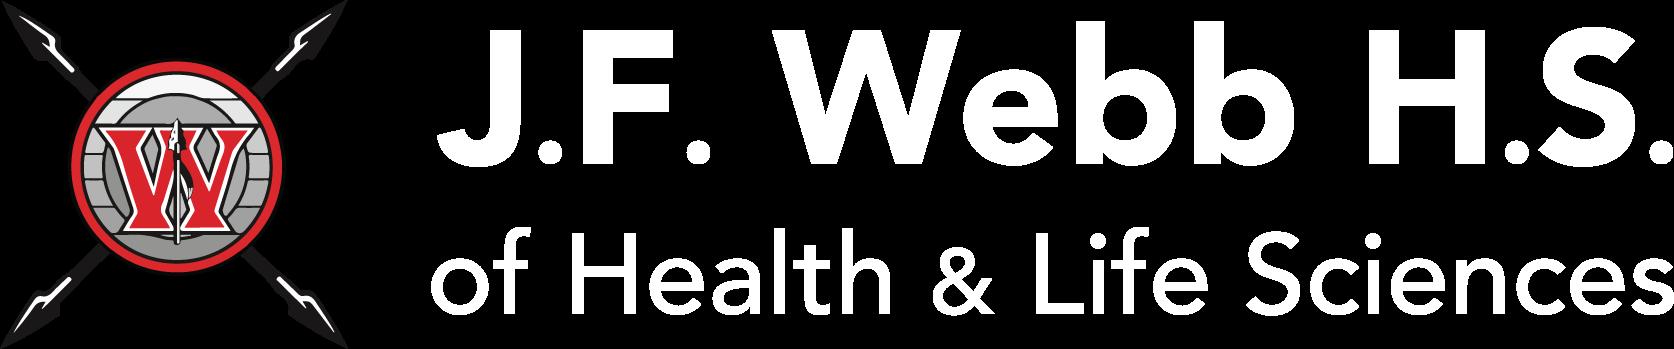 J.F. Webb High School of Health & Life Sciences